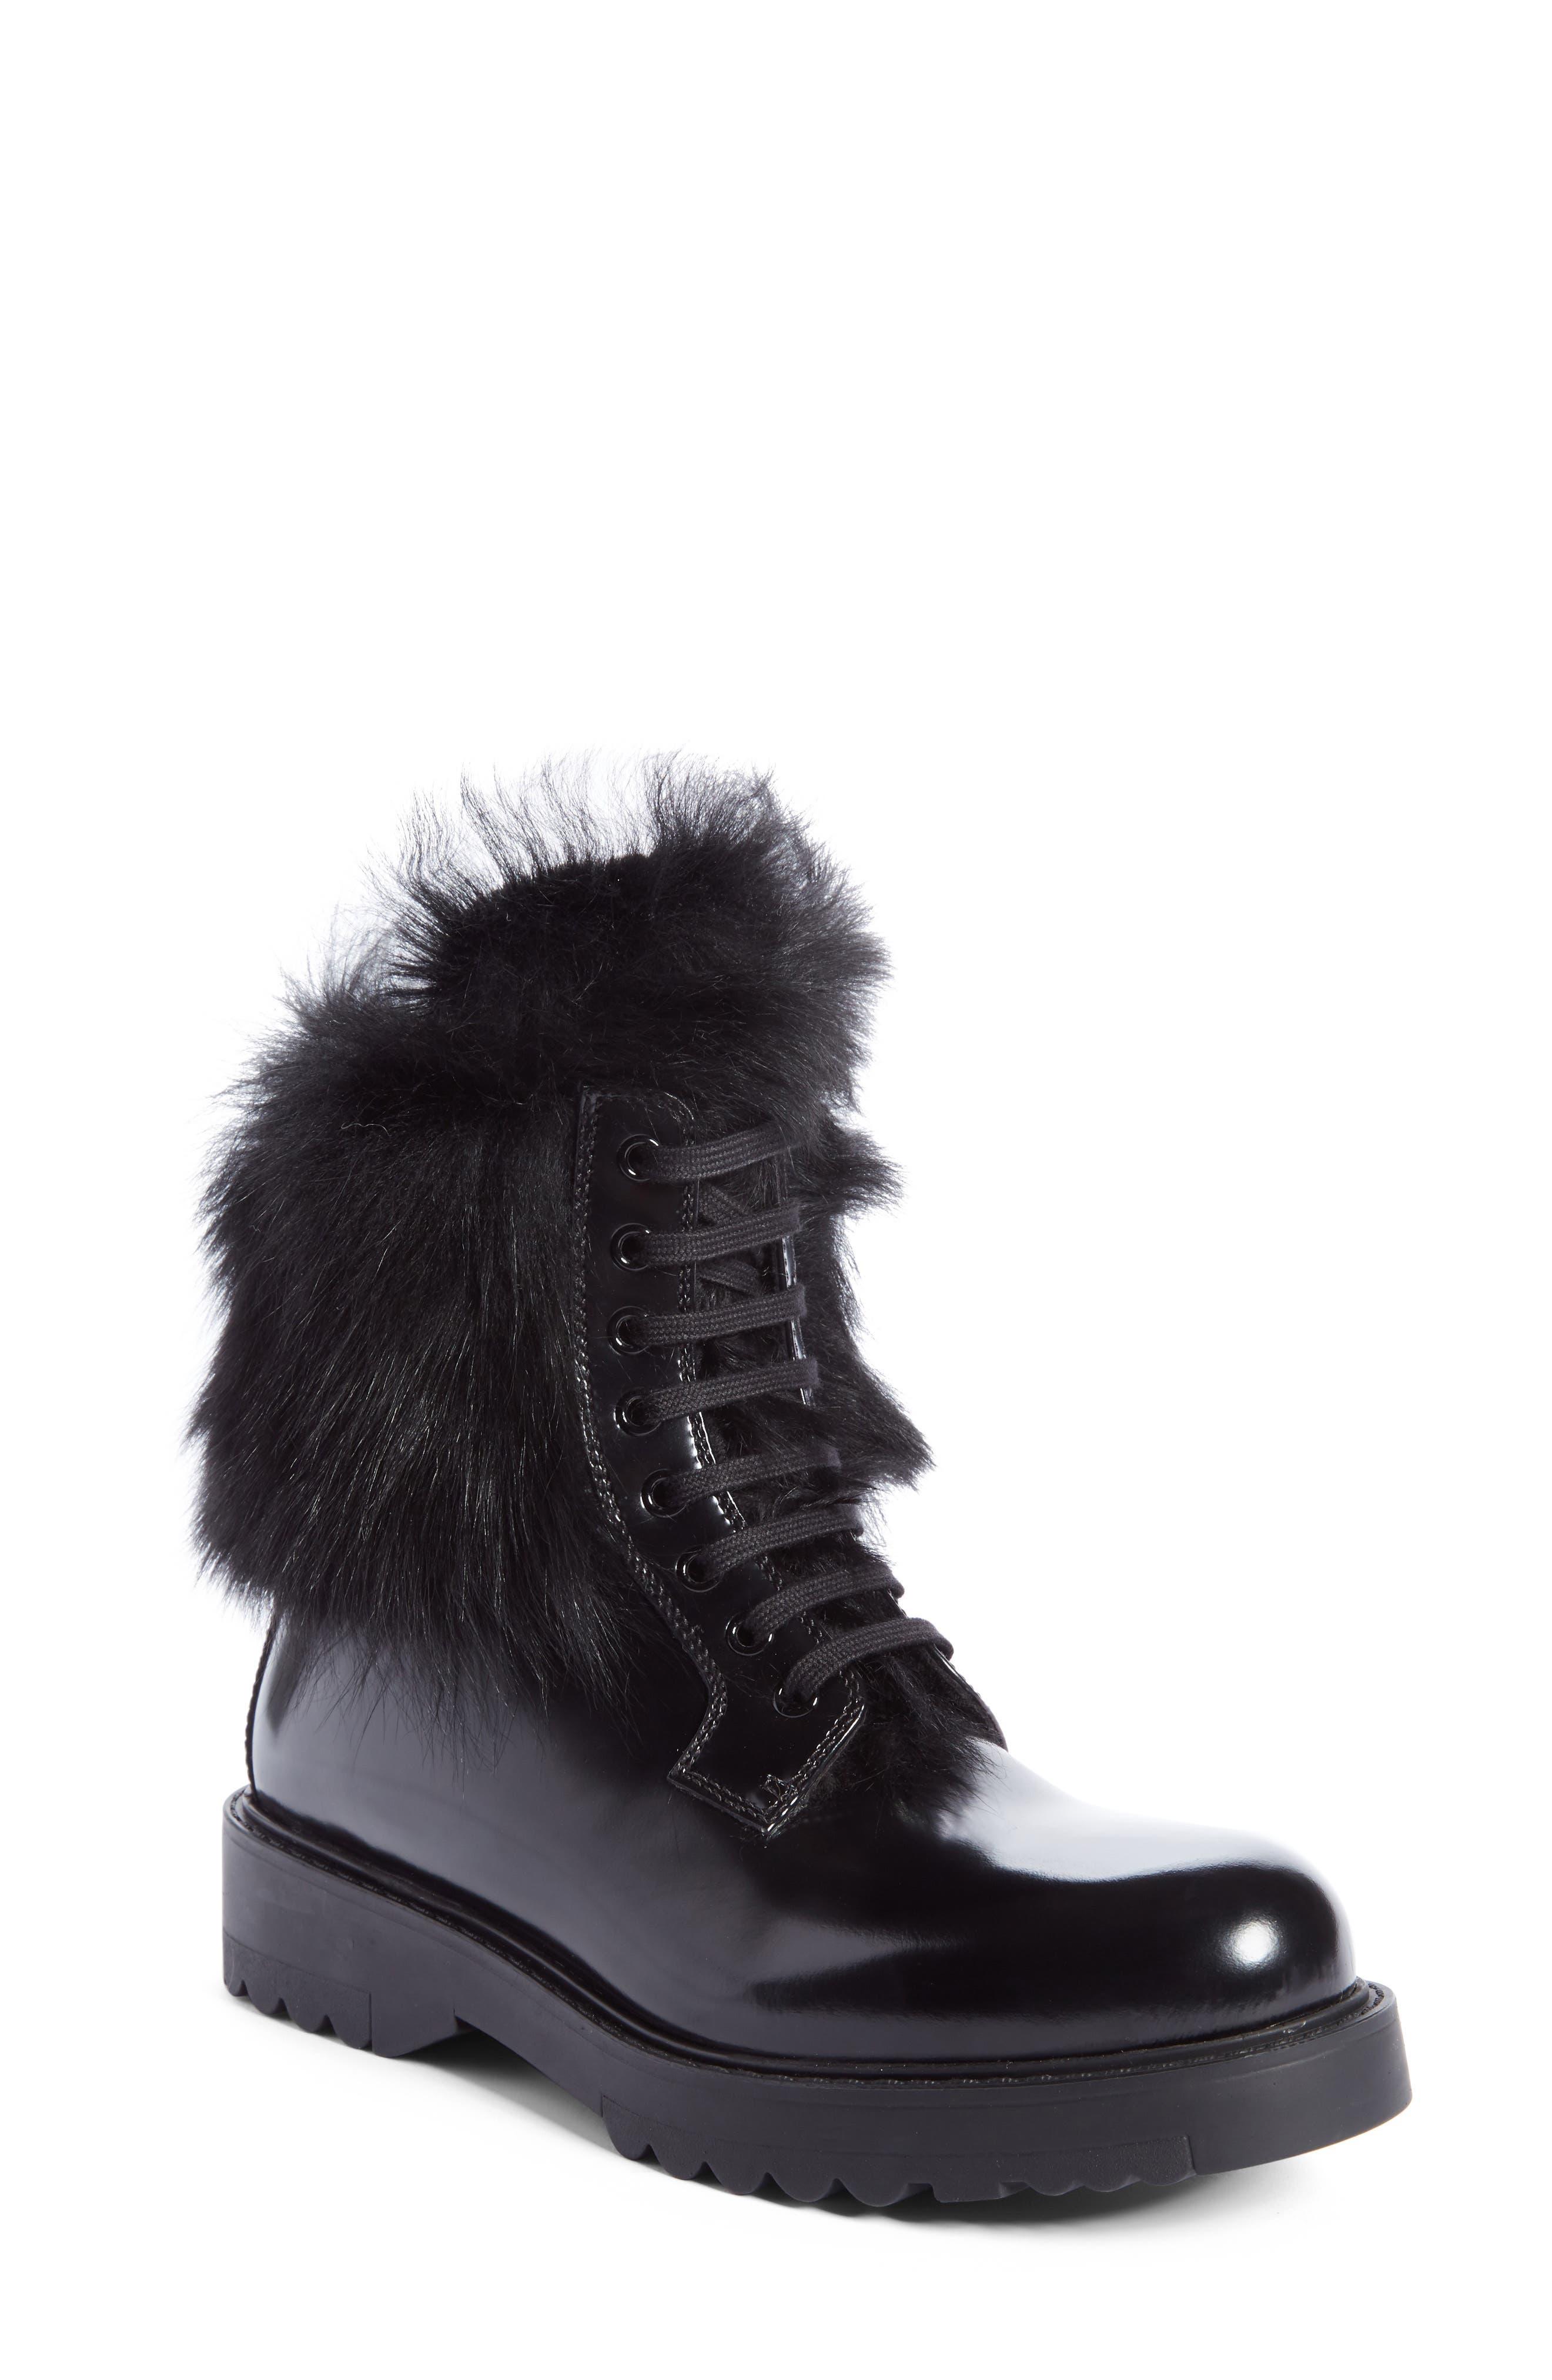 Main Image - Prada Genuine Shearling Lined Boot (Women)